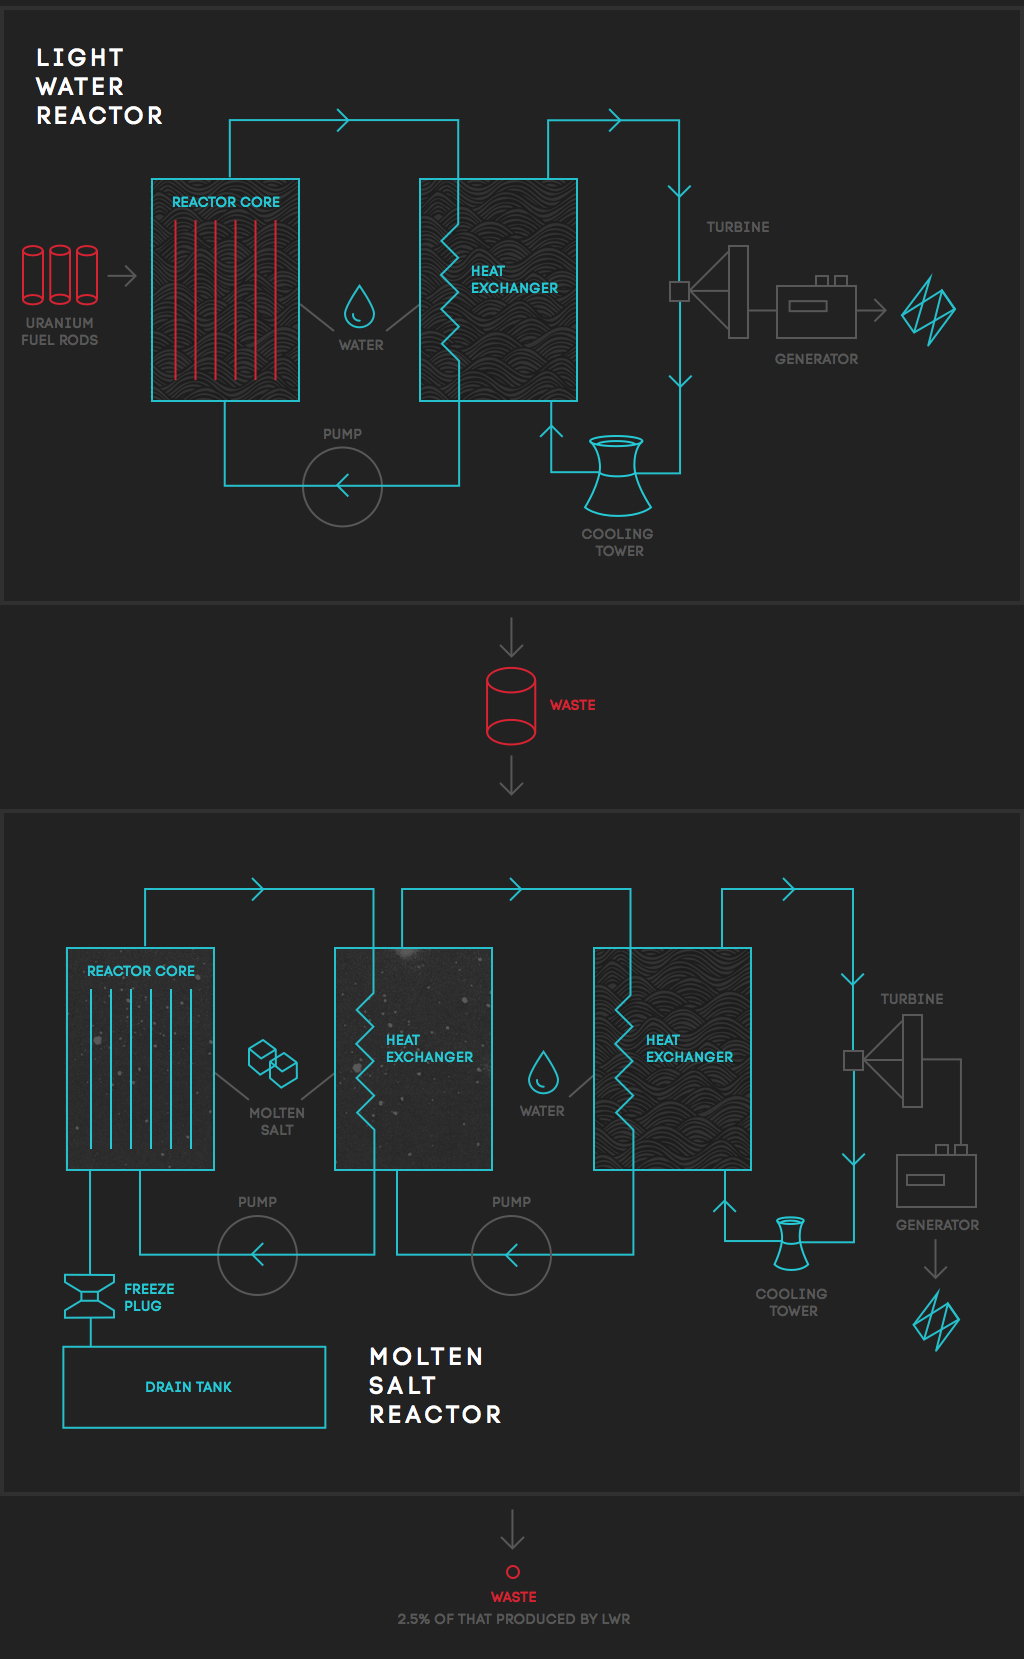 compare-reactors